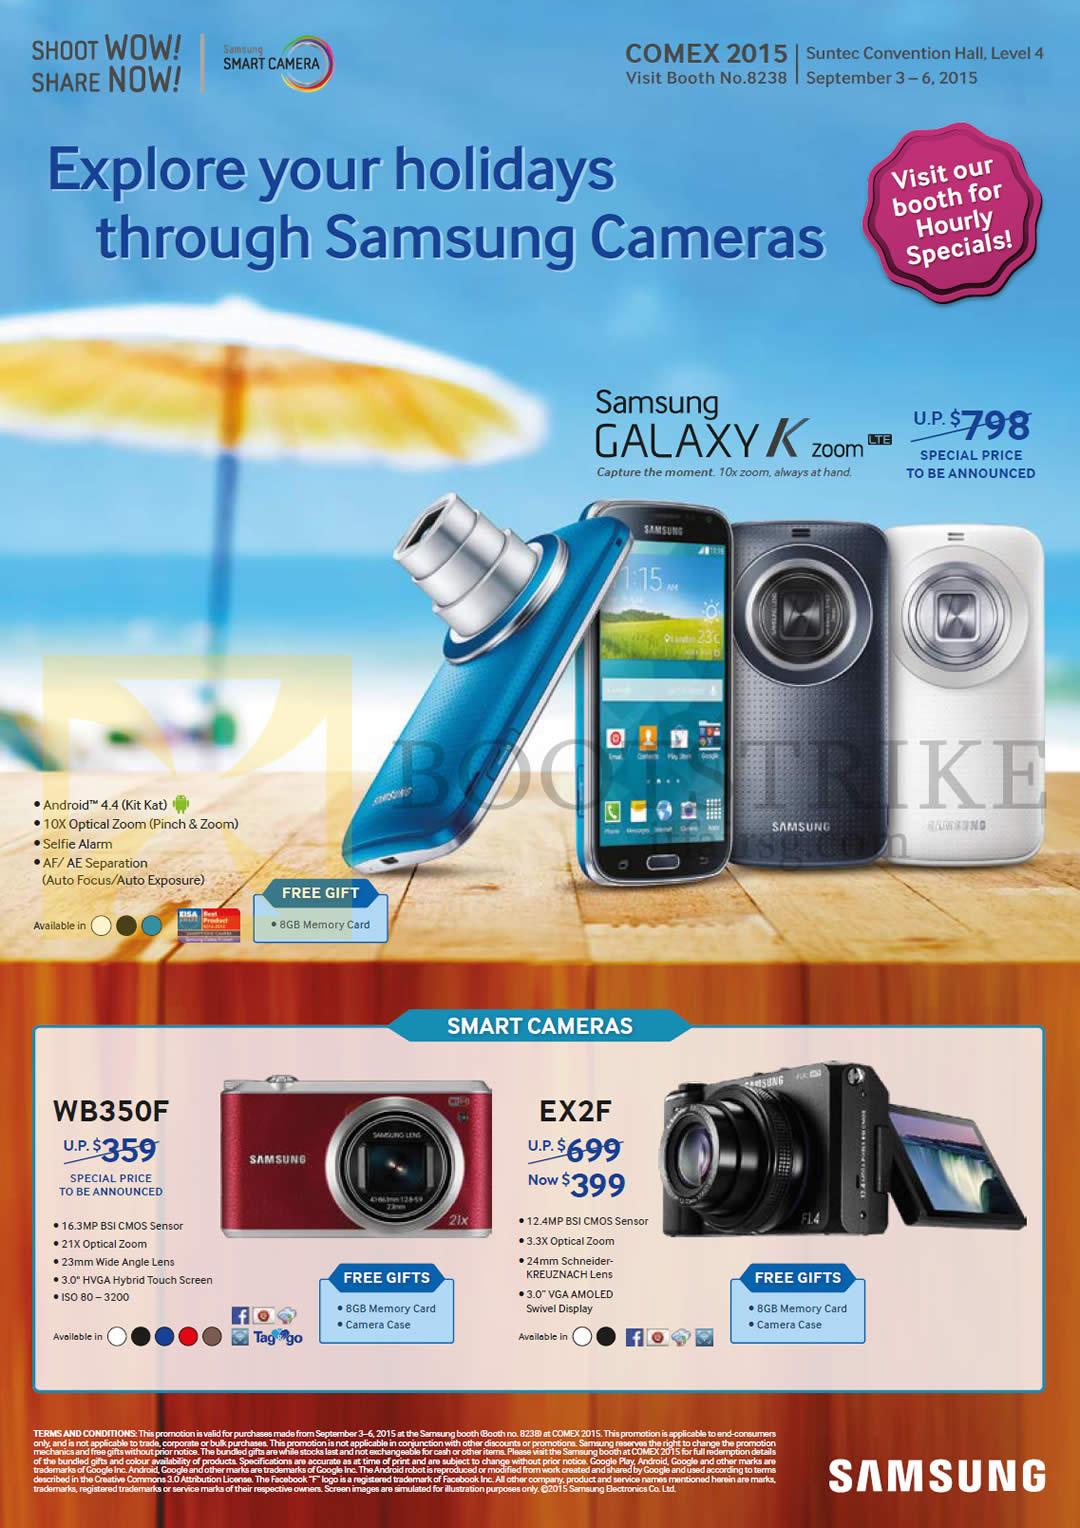 Samsung Digital Cameras, WB350F, EX2F